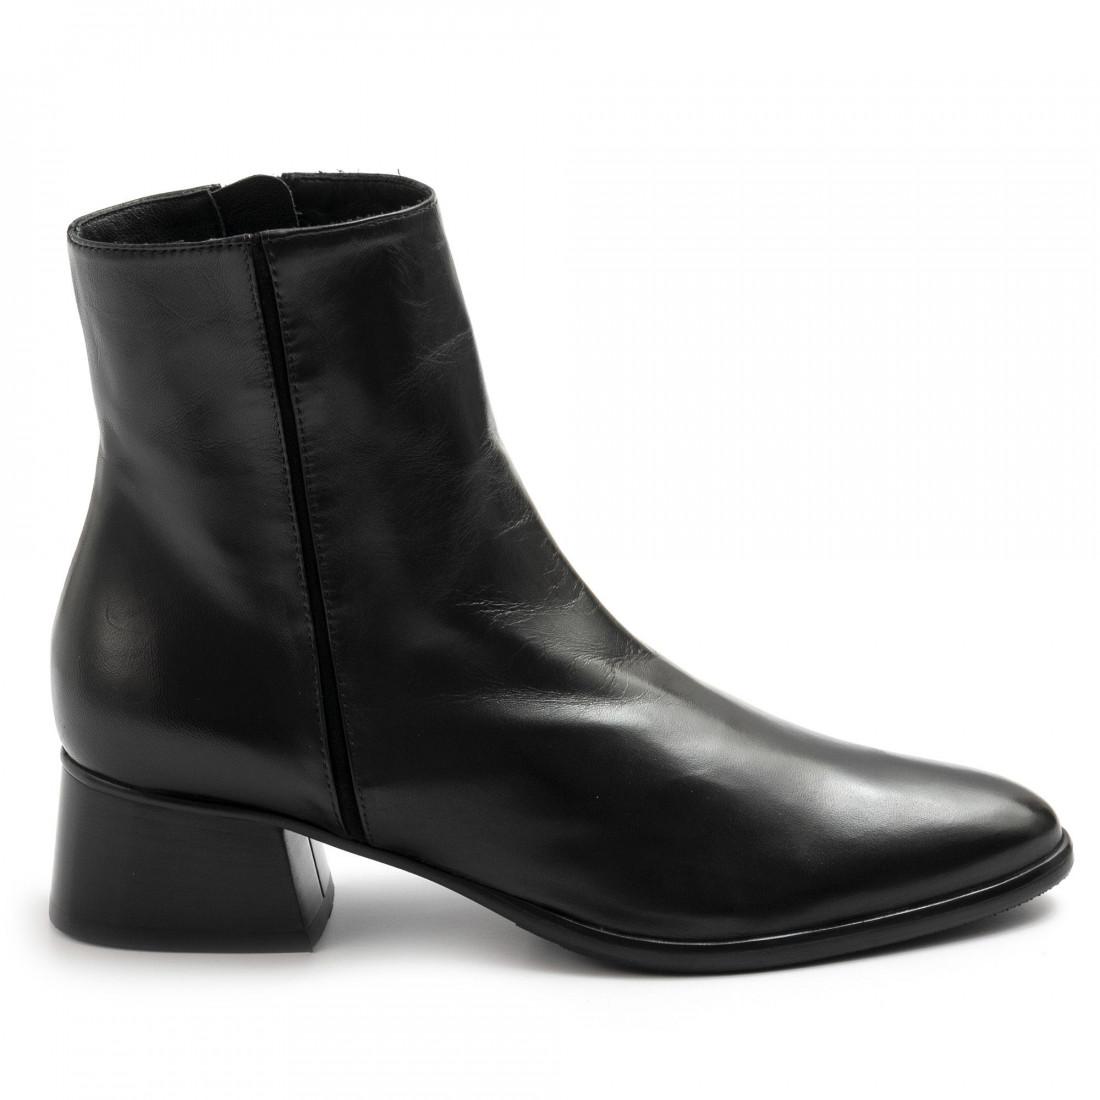 booties woman lorenzo masiero w203954nappa abb nero 7752